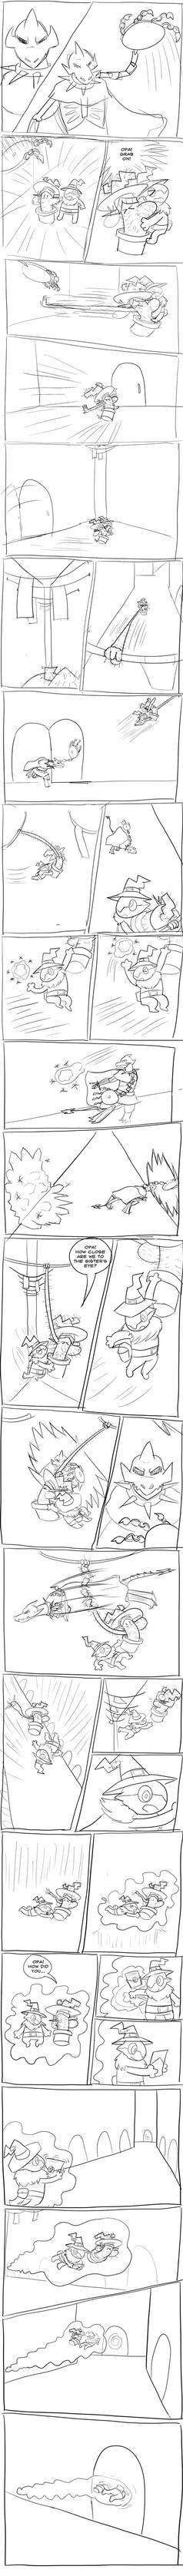 Wizard Palooza OCT: Round 3 Page 9 by PSIJoel